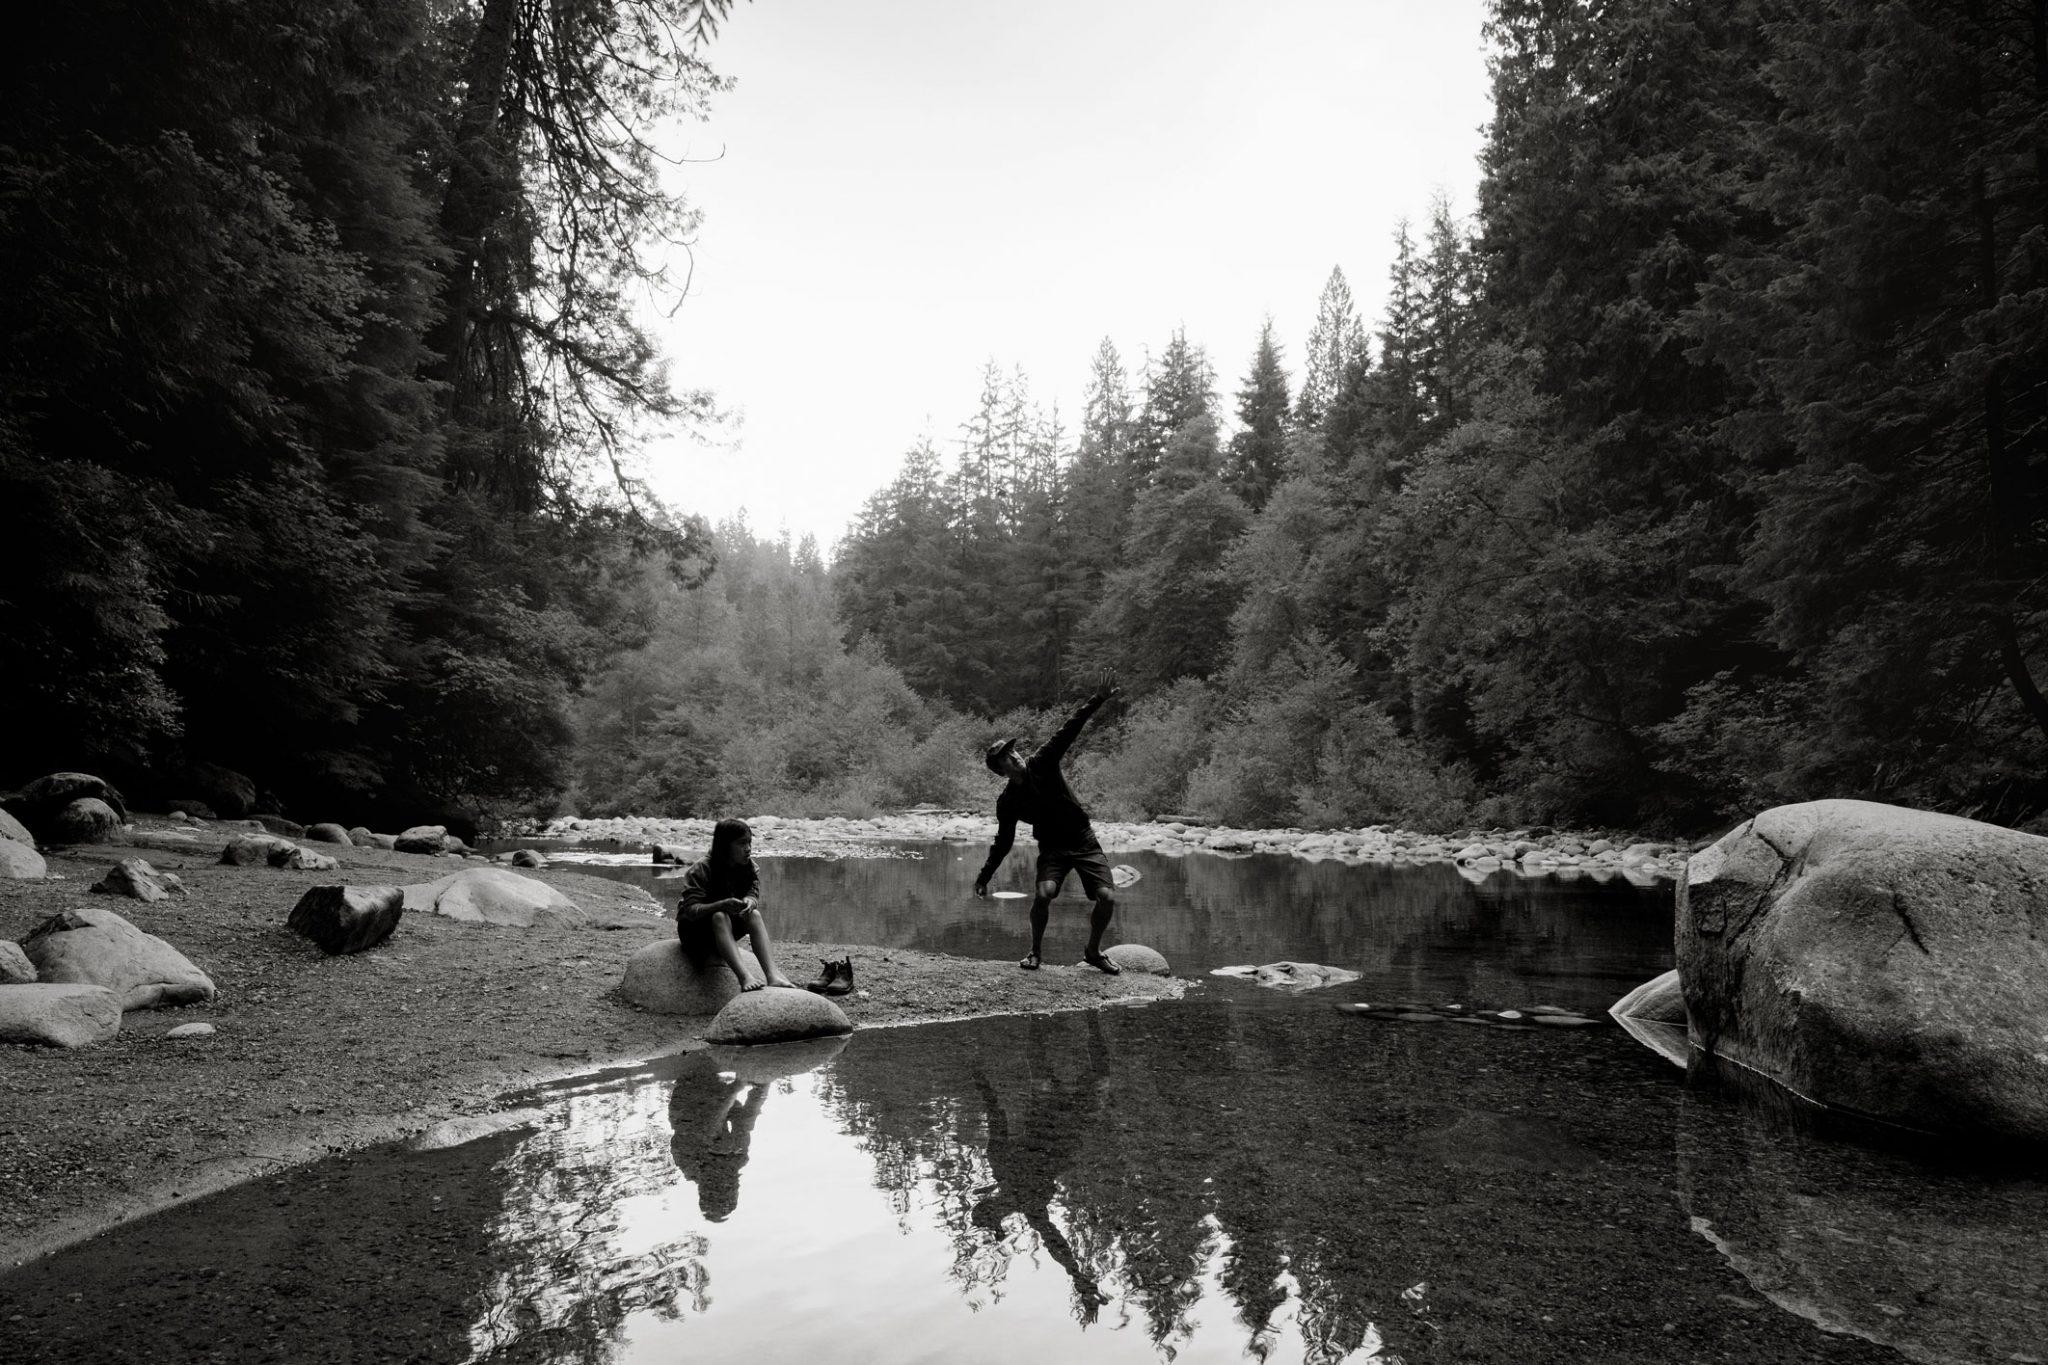 family skipping rocks